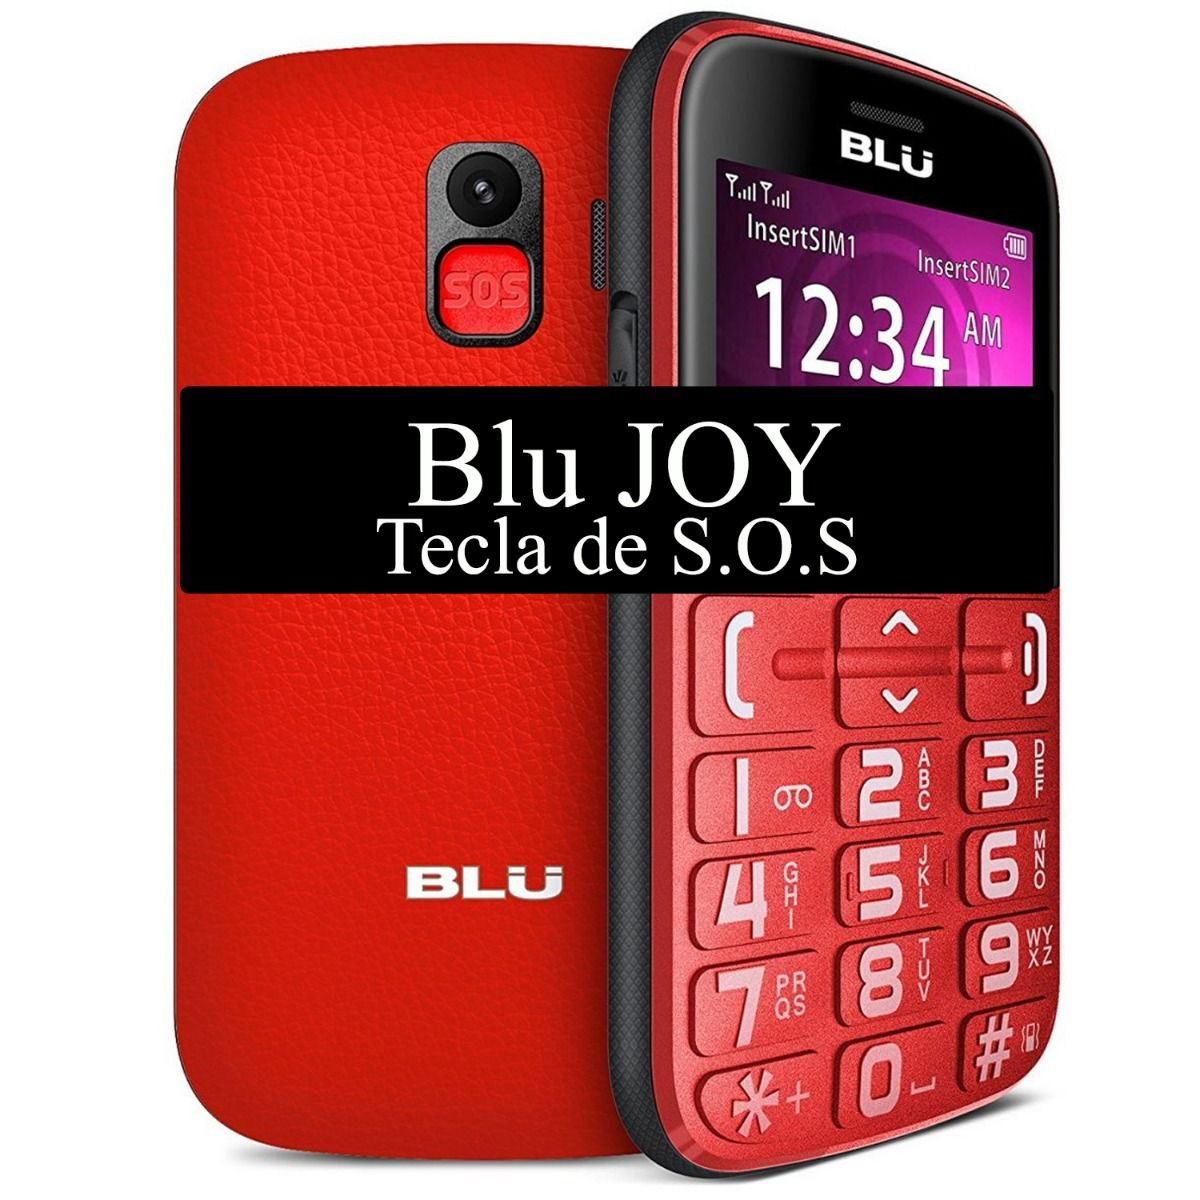 Celular Blu Joy 2.4 Dual Sim 2.4'' Câmera Vga Ideal P/ Idoso